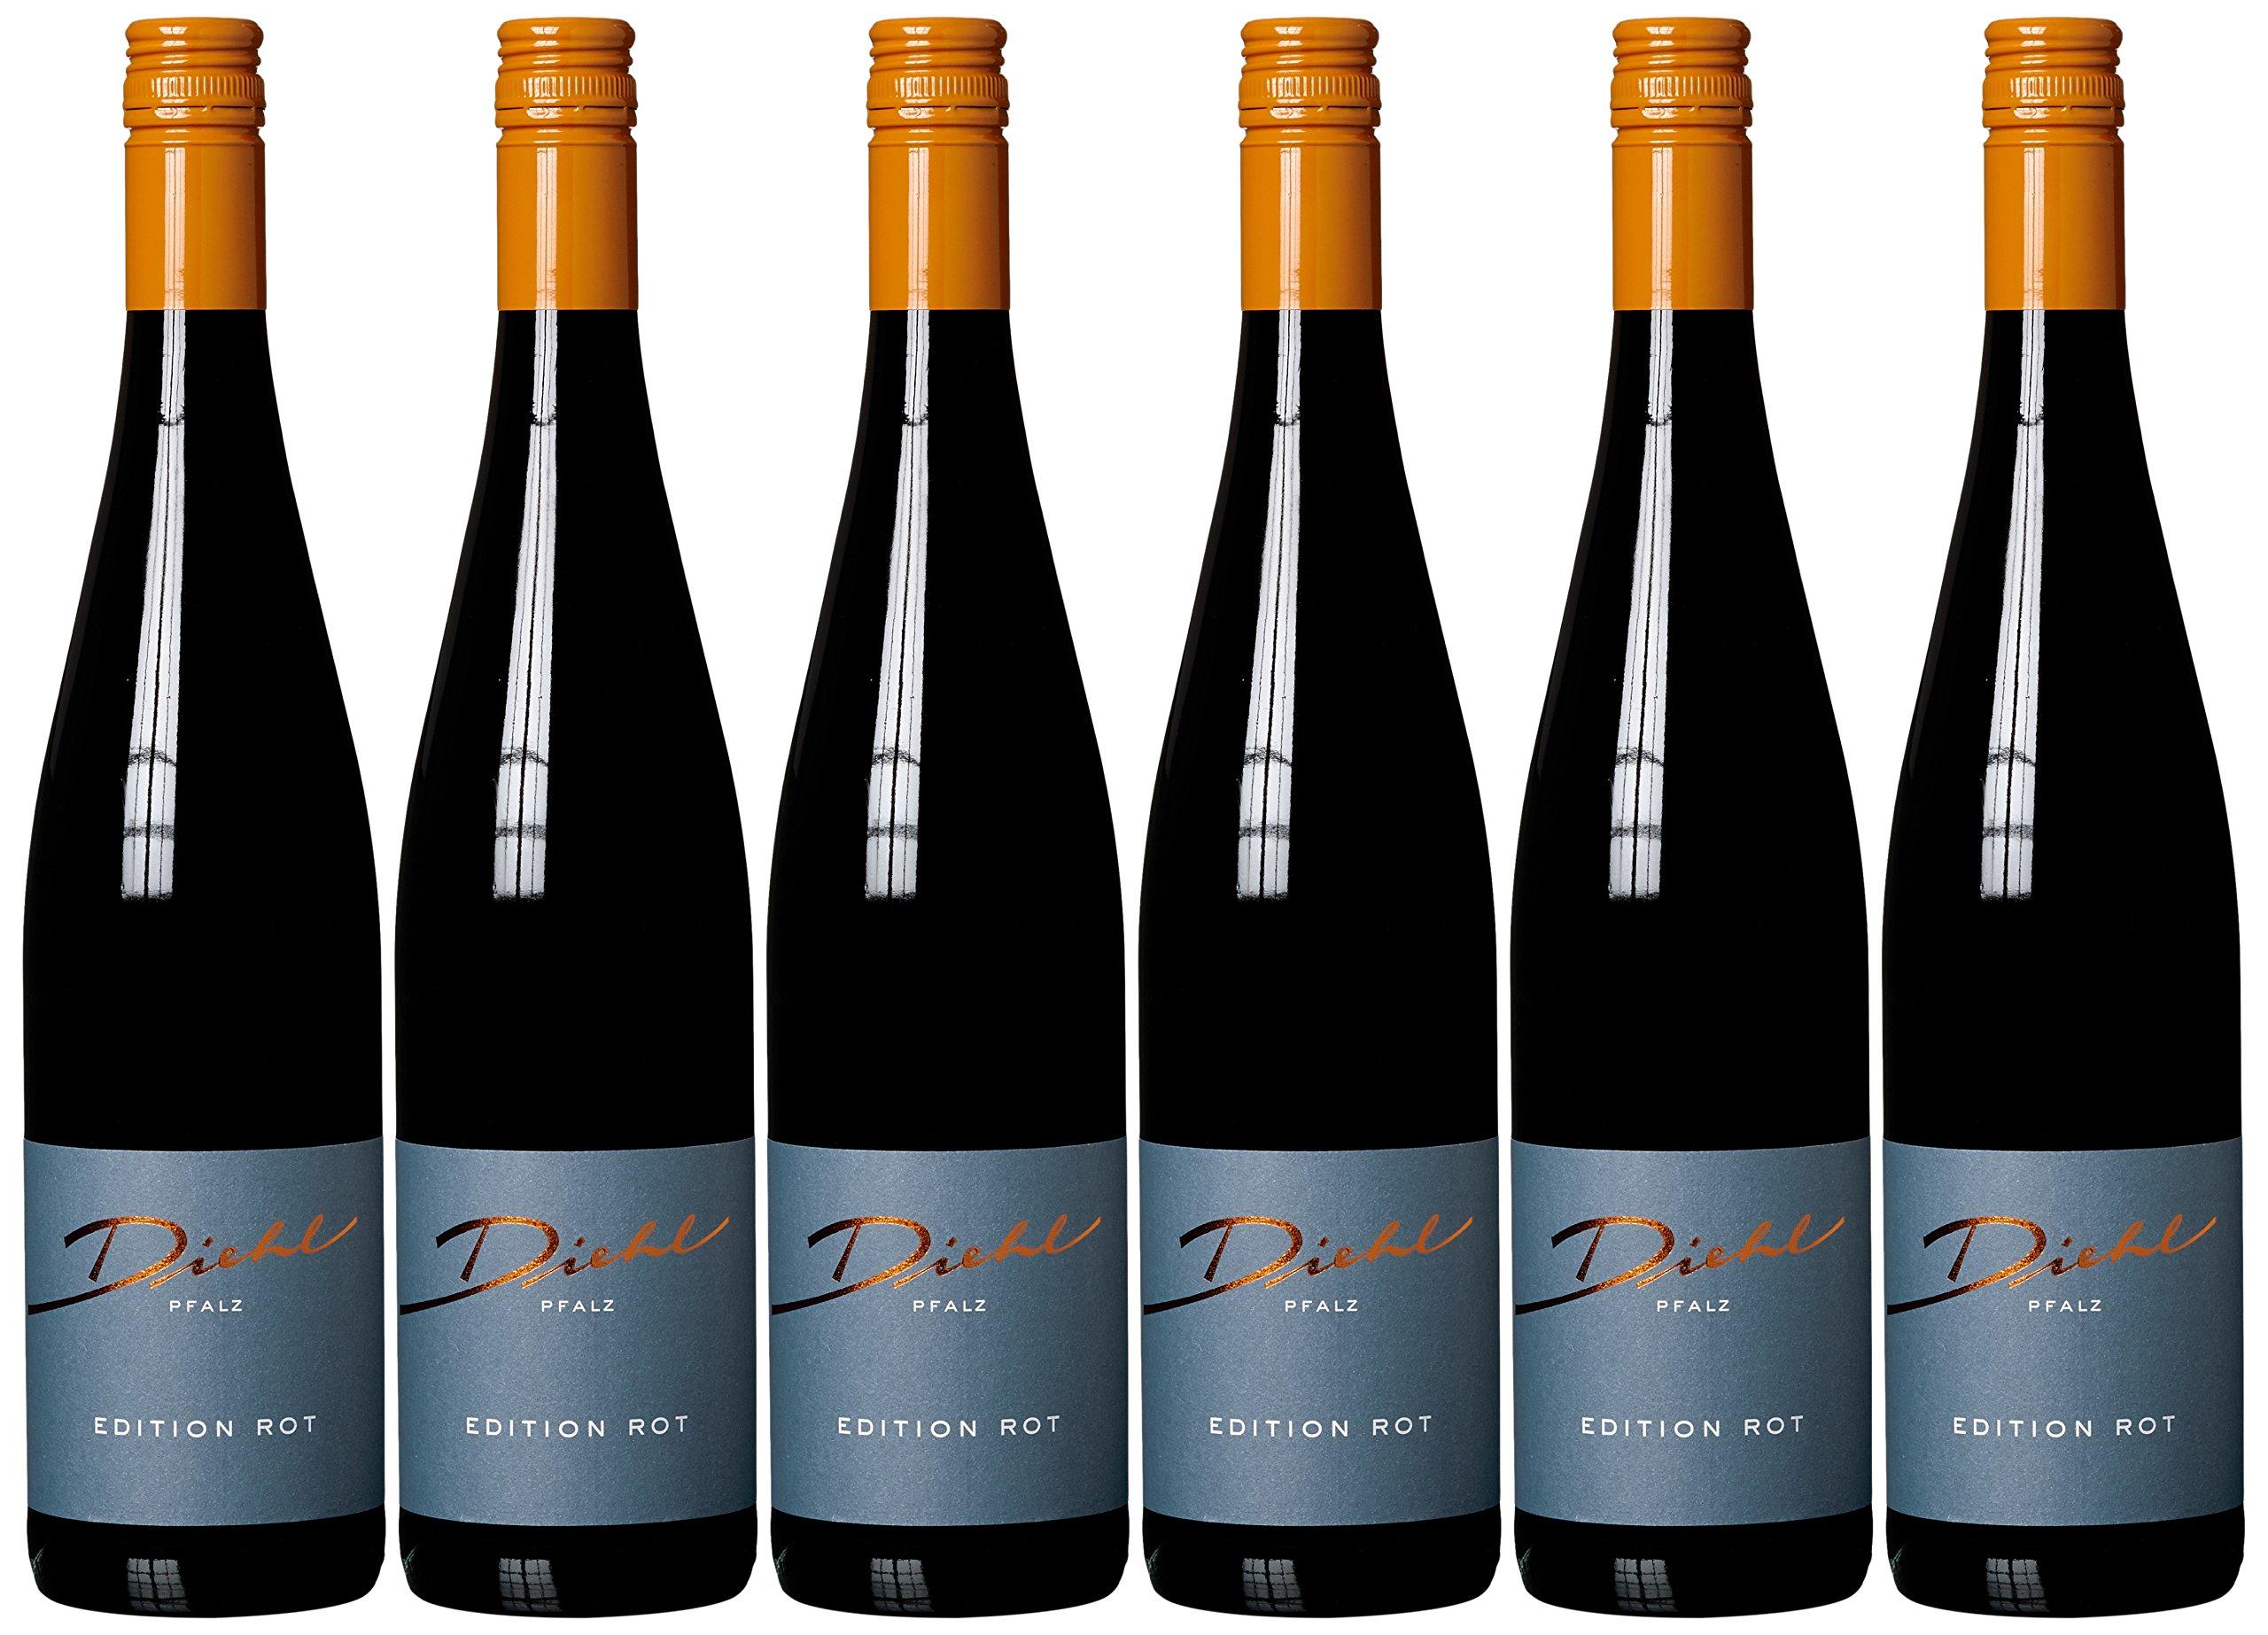 Weingut-Diehl-Pfalz-Edition-Rot-Dornfelder-Feinherb-6-x-075-l